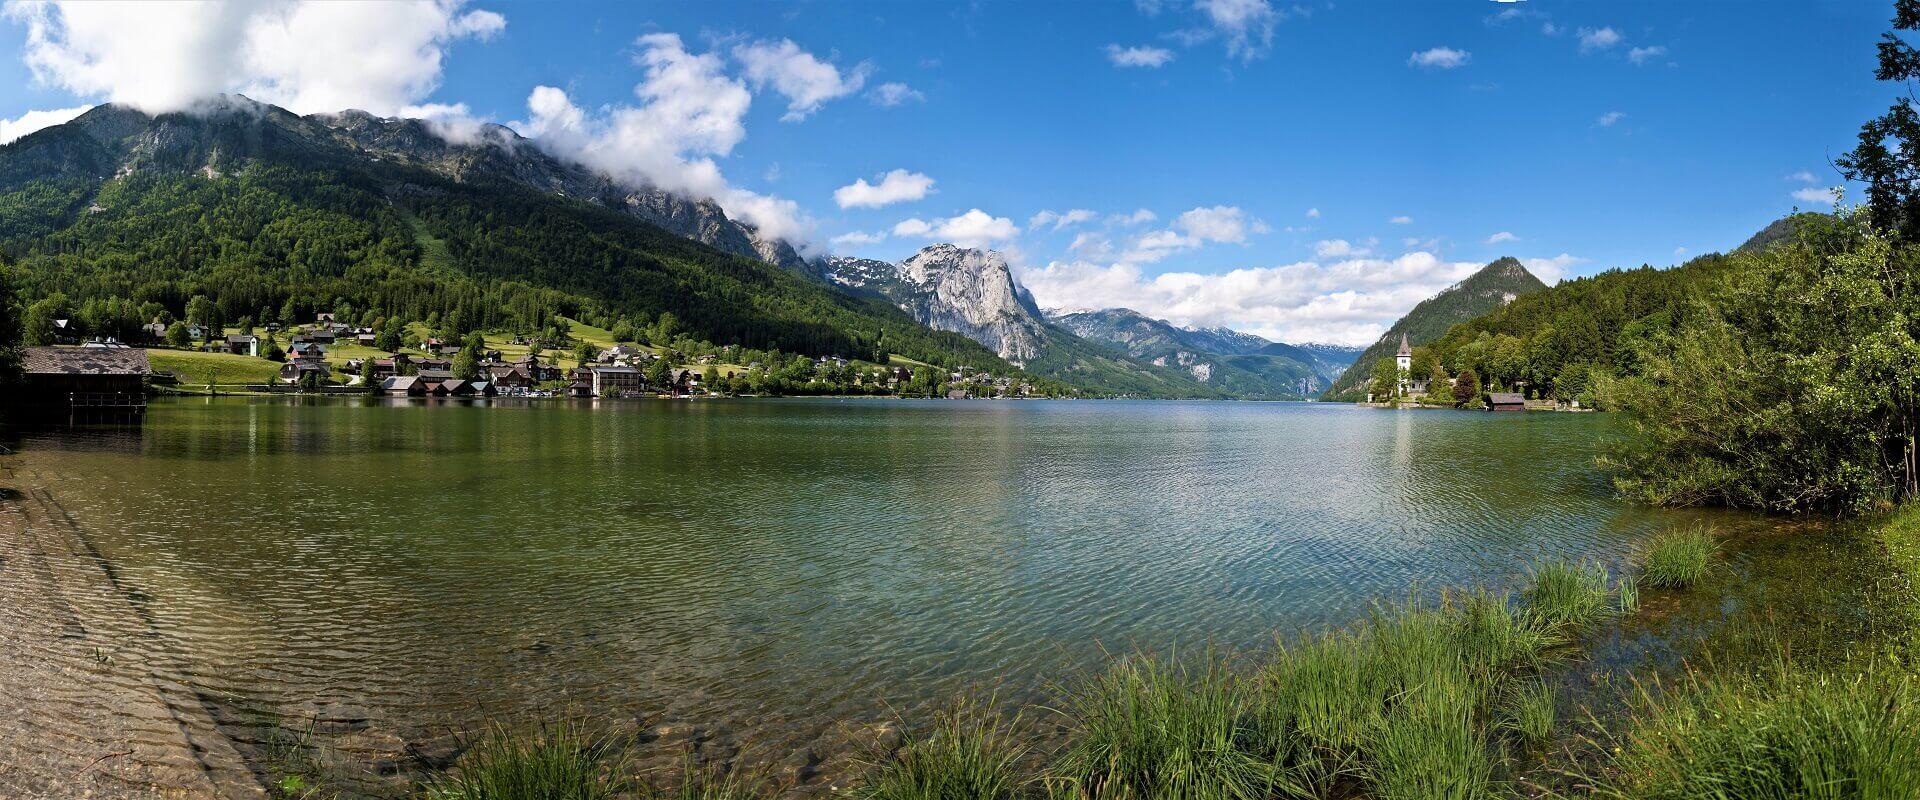 10 søer i Salzkammergut